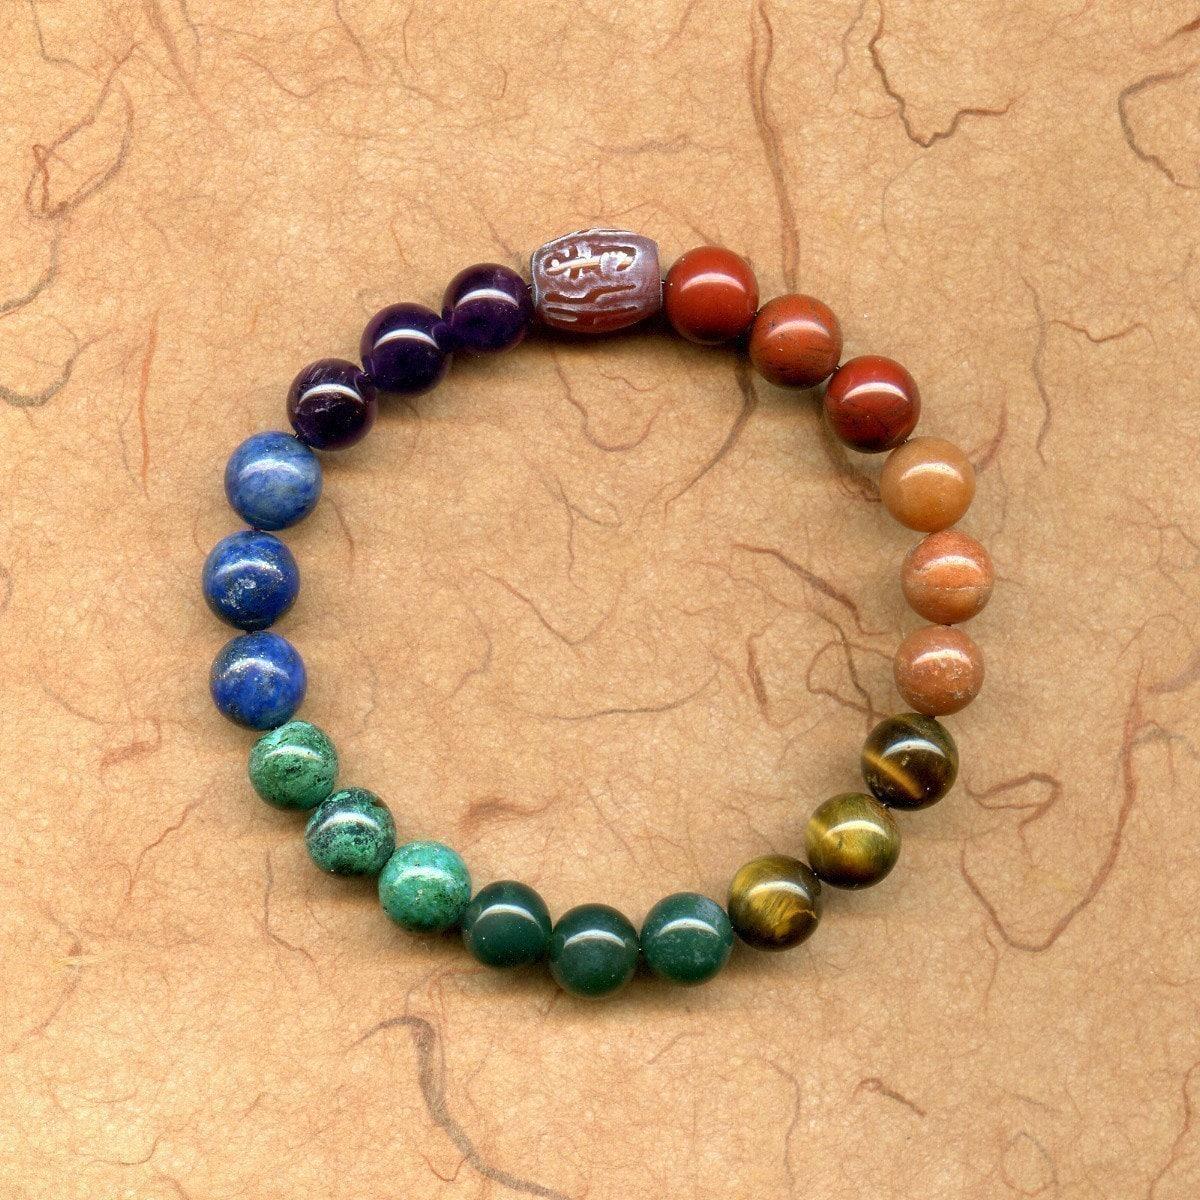 Yoga Beads: Heal 7 Chakra Meditation Bead Bracelet Mala With Mantra Bead